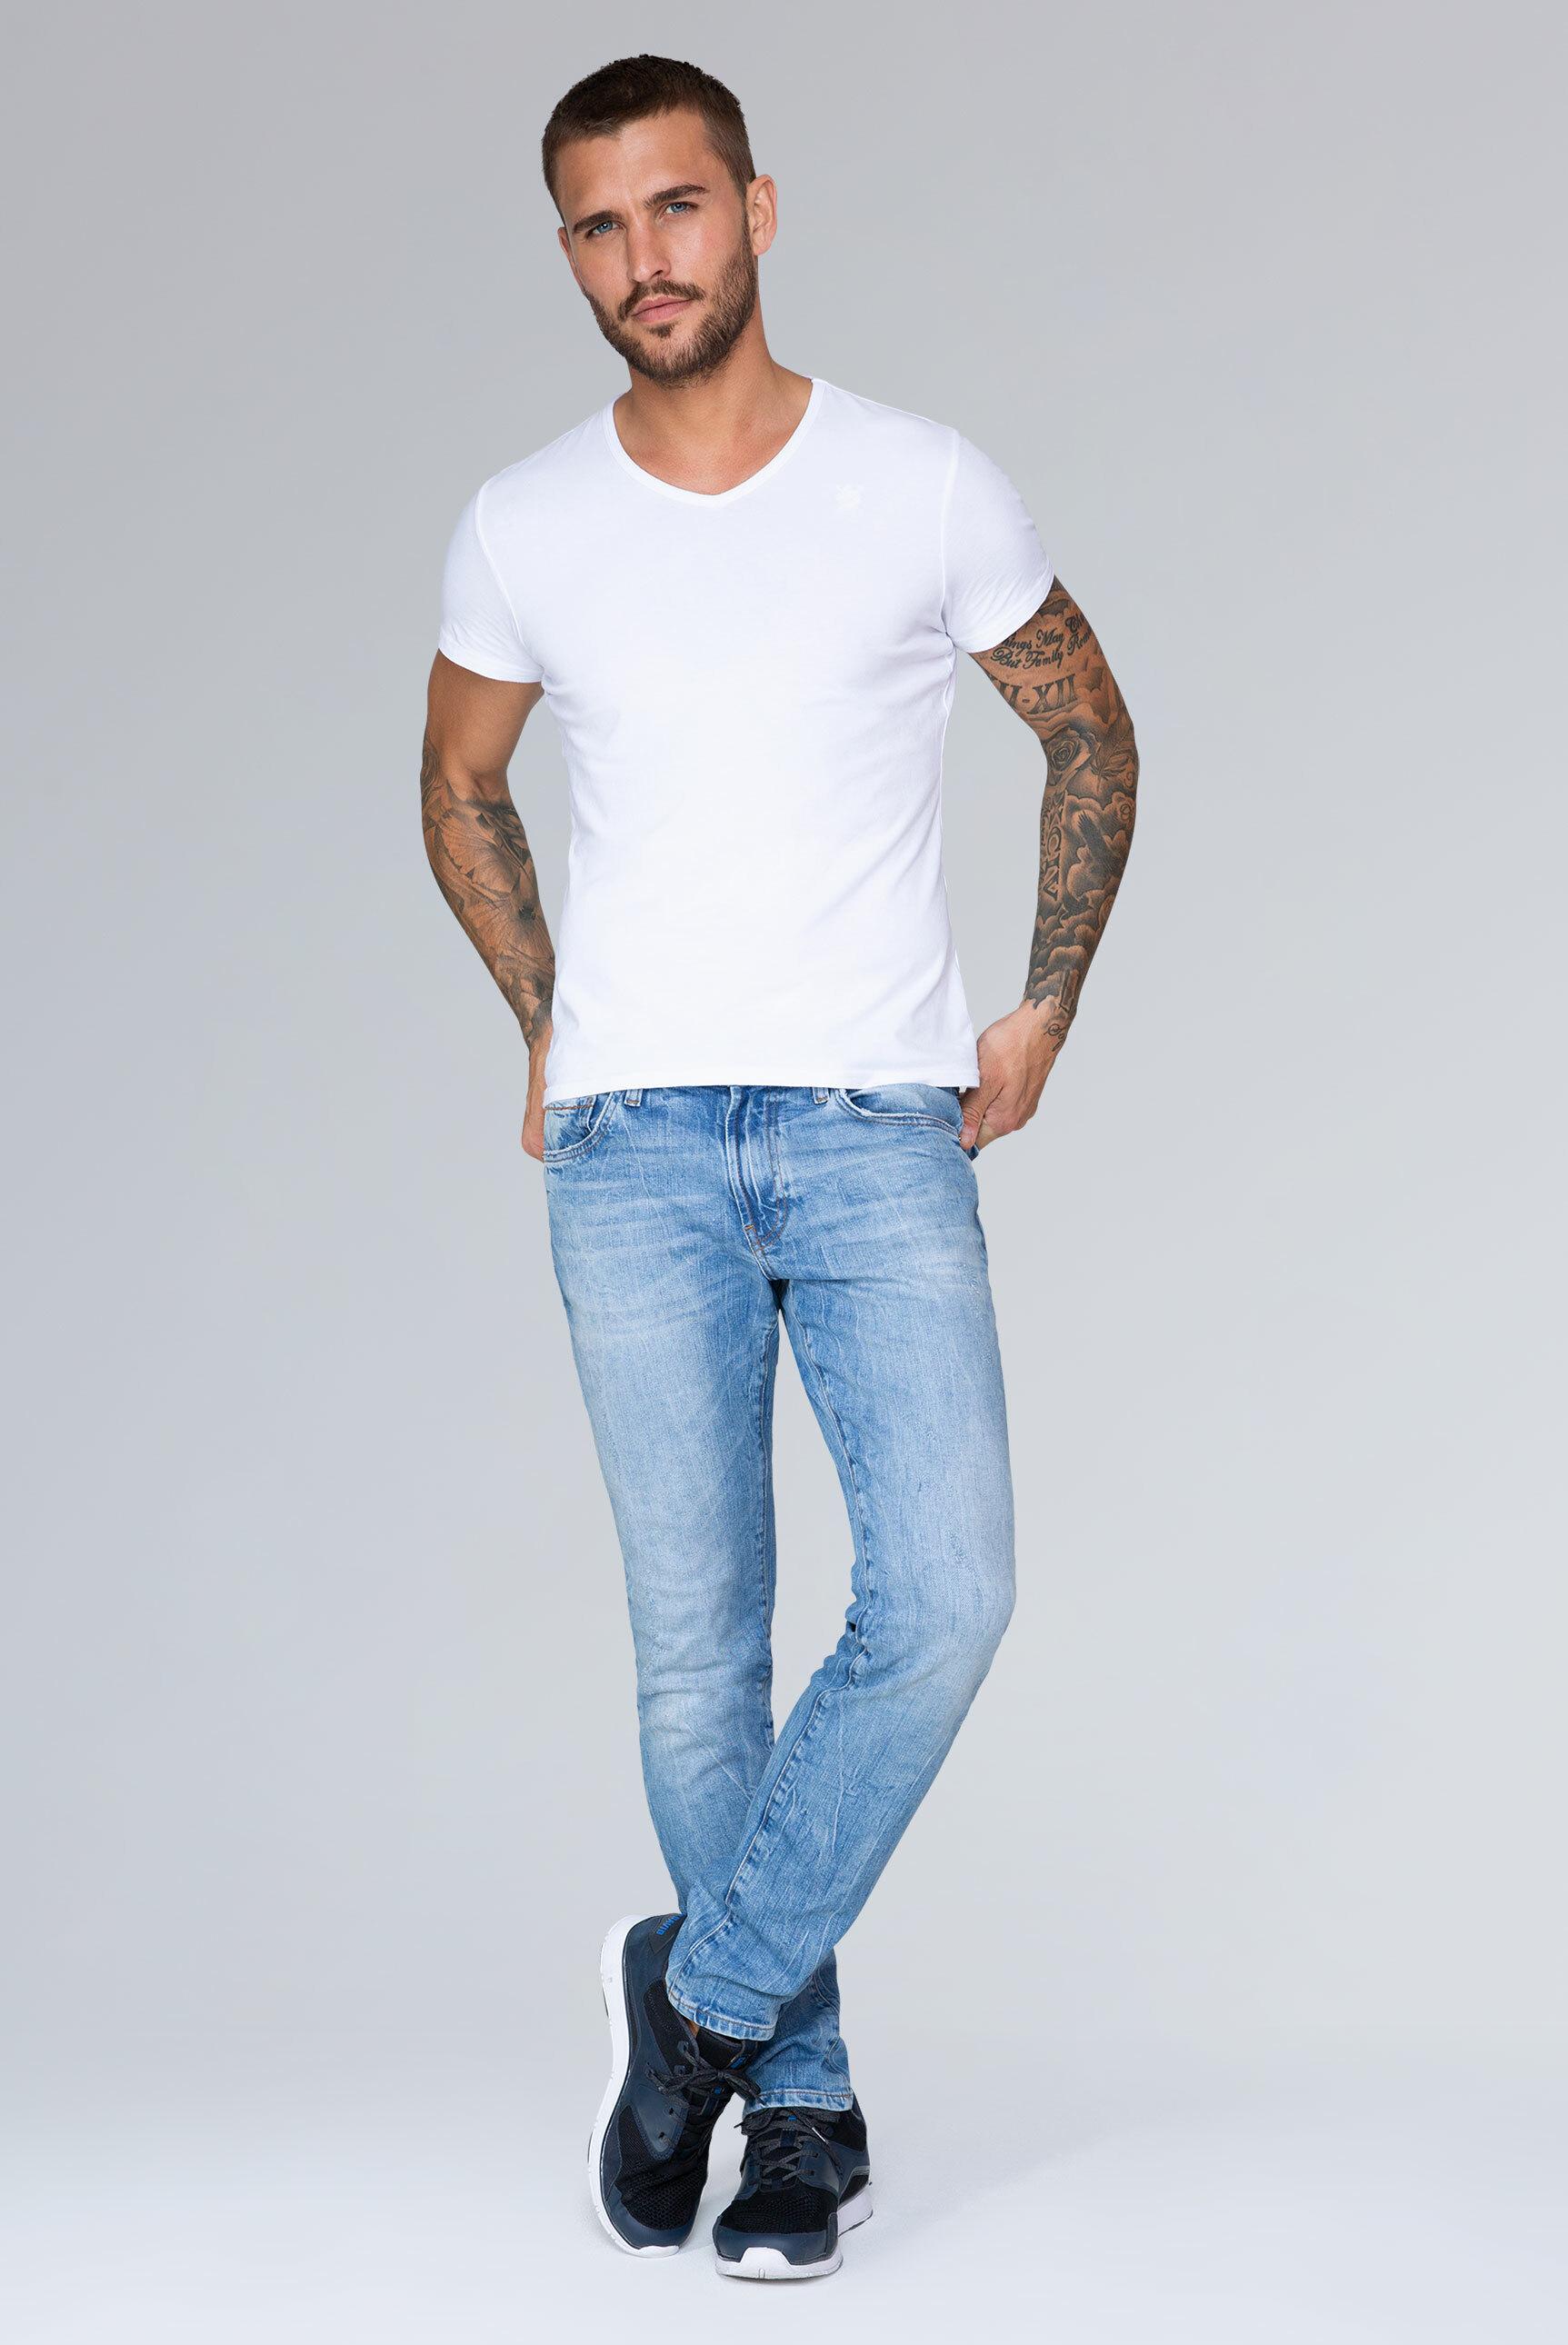 Five Pocket Jeans NI:LS im Light Used Look